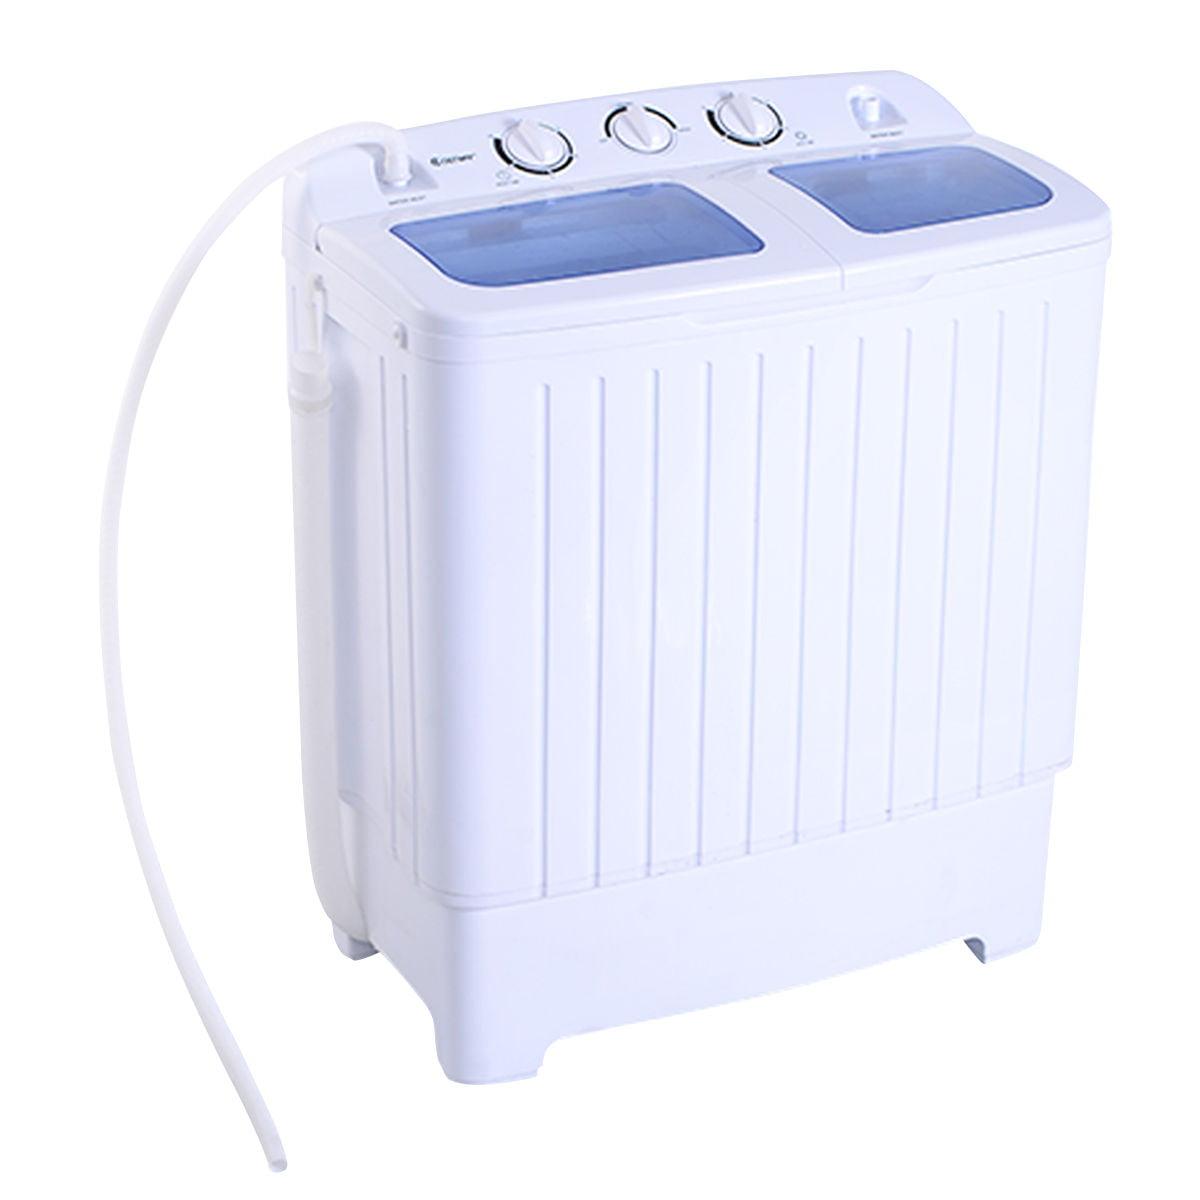 Costway Portable Mini Compact Twin Tub 17 6lb Washing